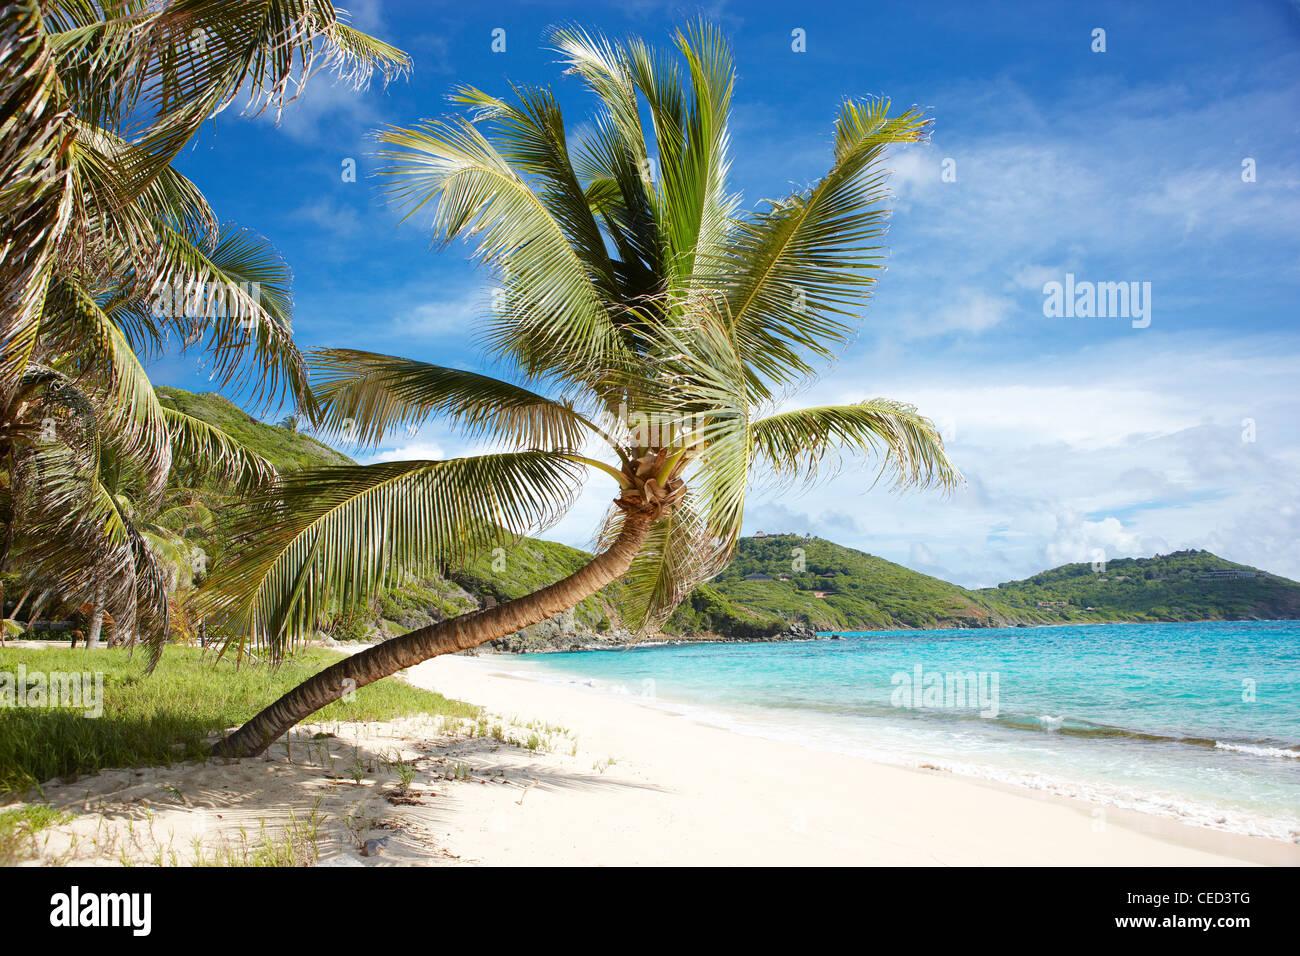 empty tropical beach palm tree - Stock Image